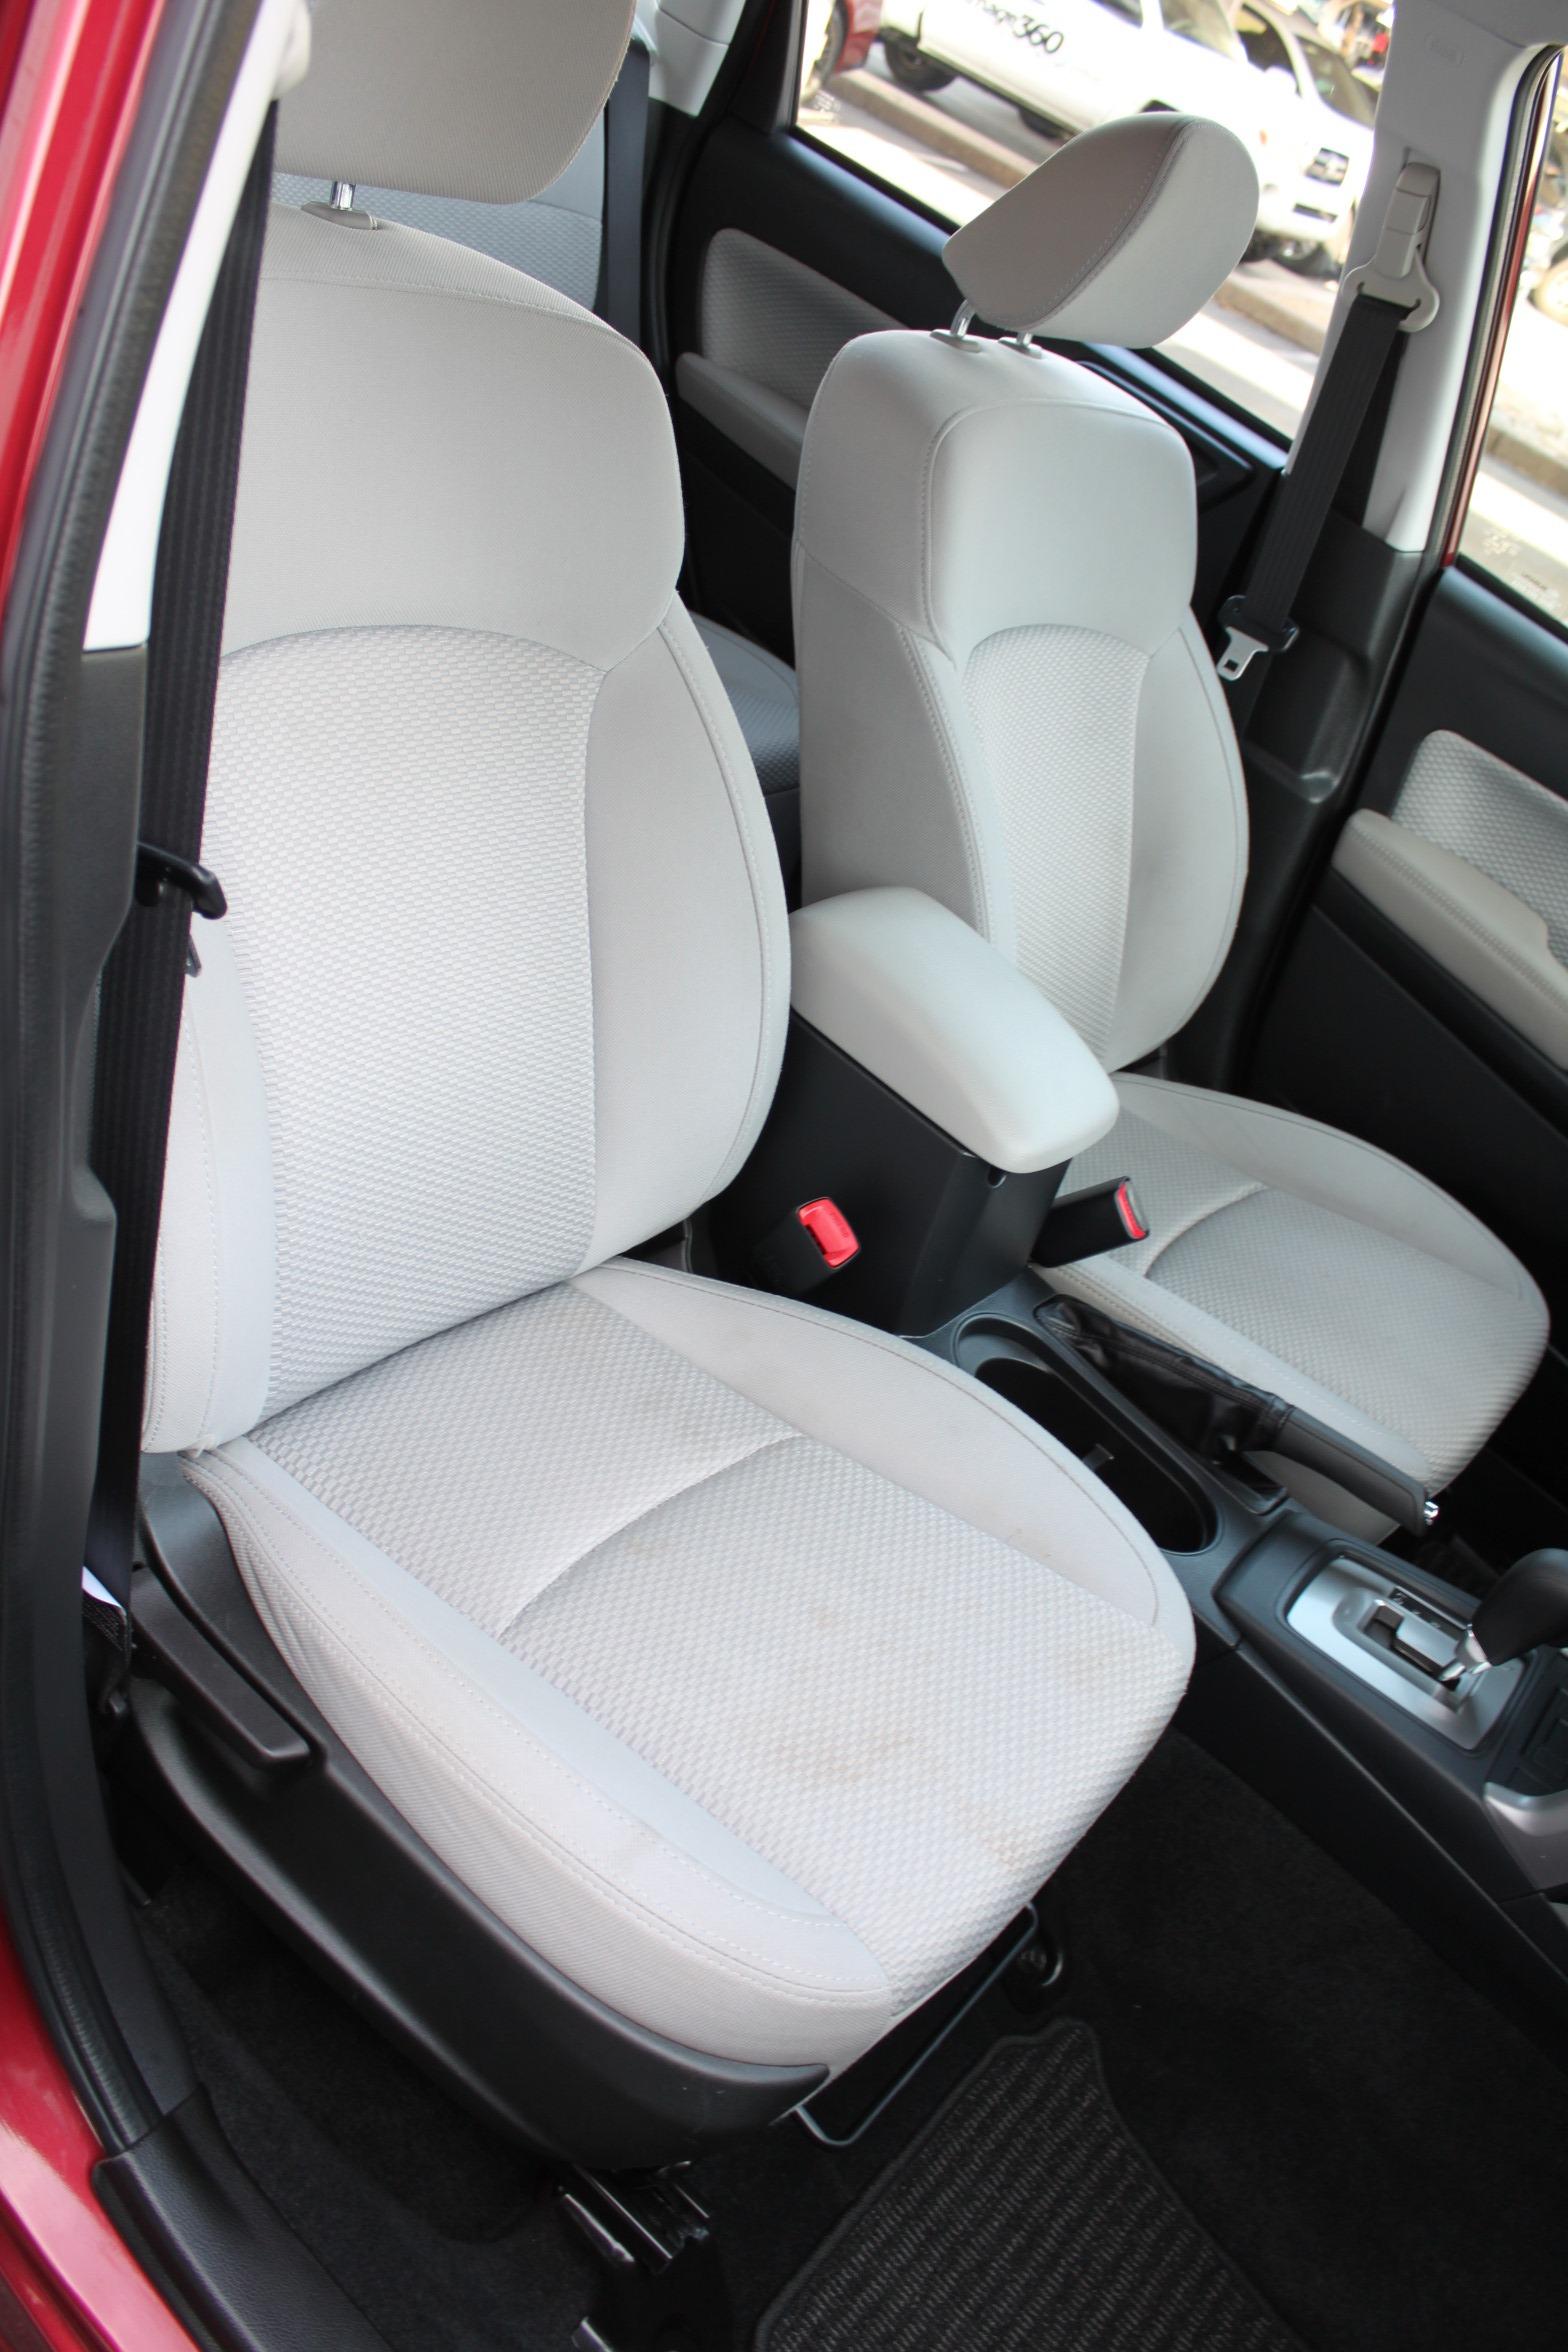 Used-2017-Subaru-Forester-25i-All-Wheel-Drive-25i-Cherokee